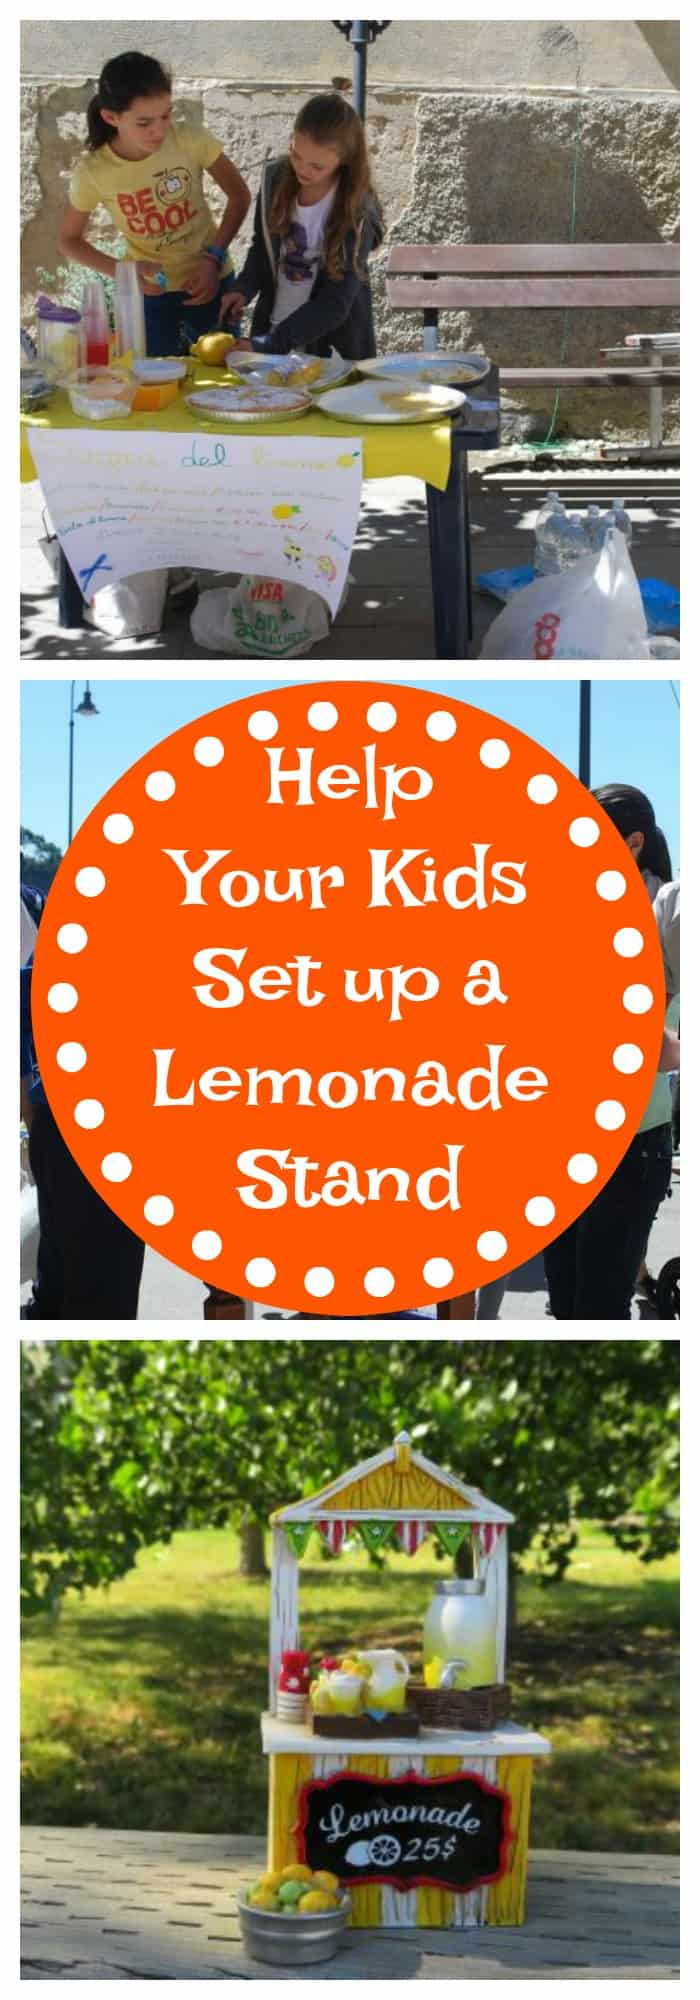 Help Your Kids Set Up a Lemonade Stand